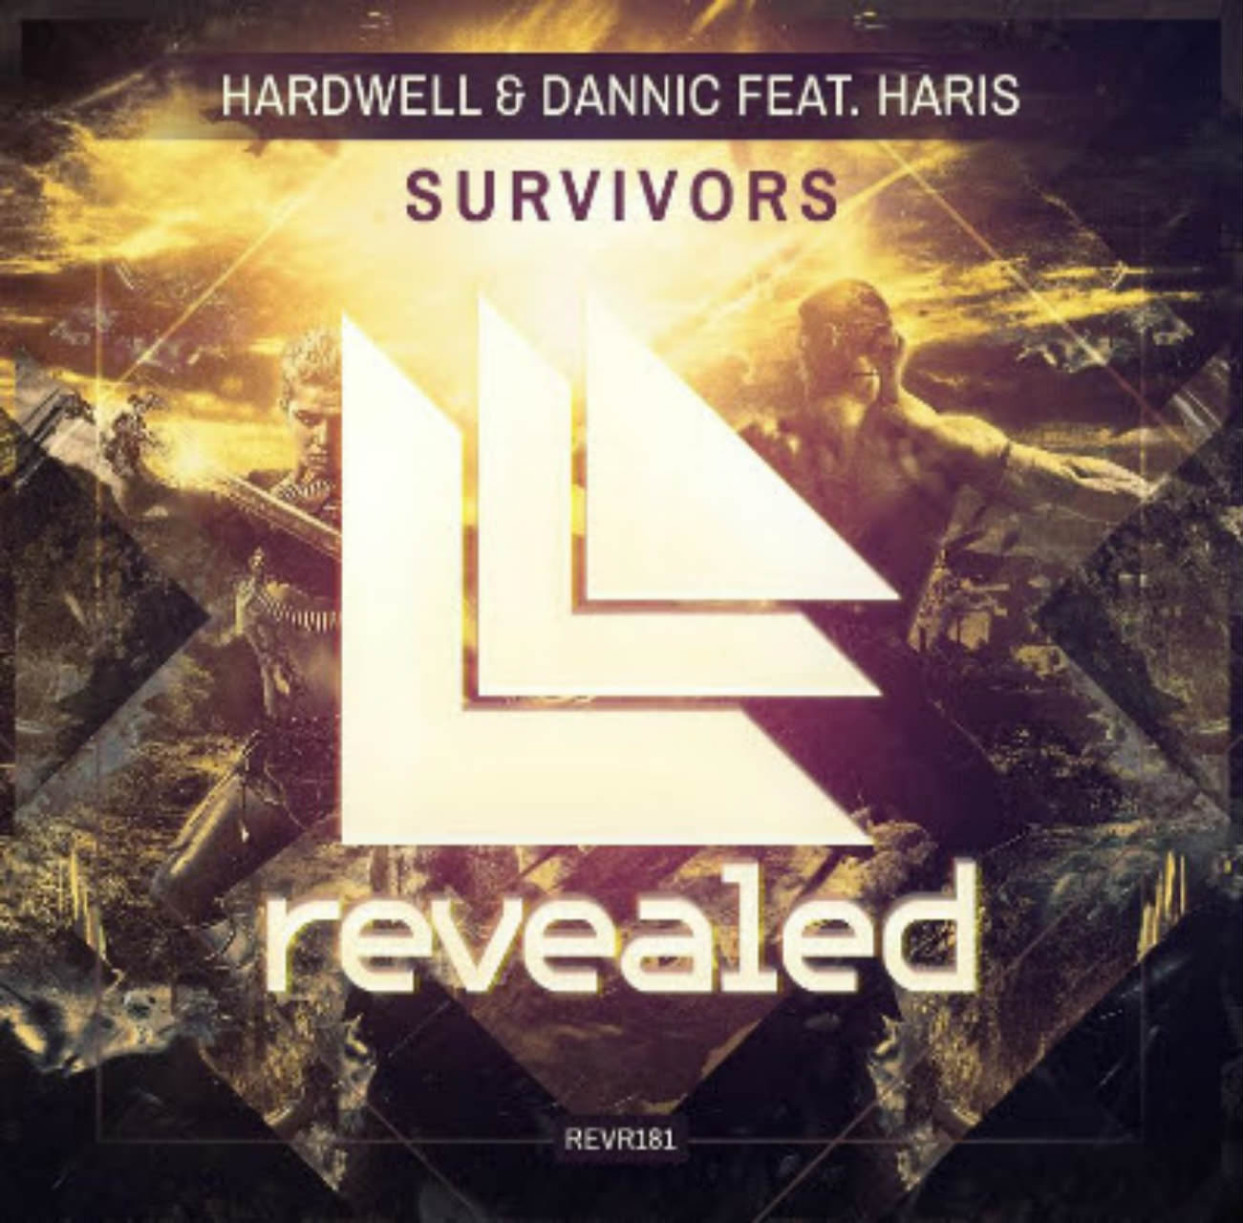 Hardwell & Dannic